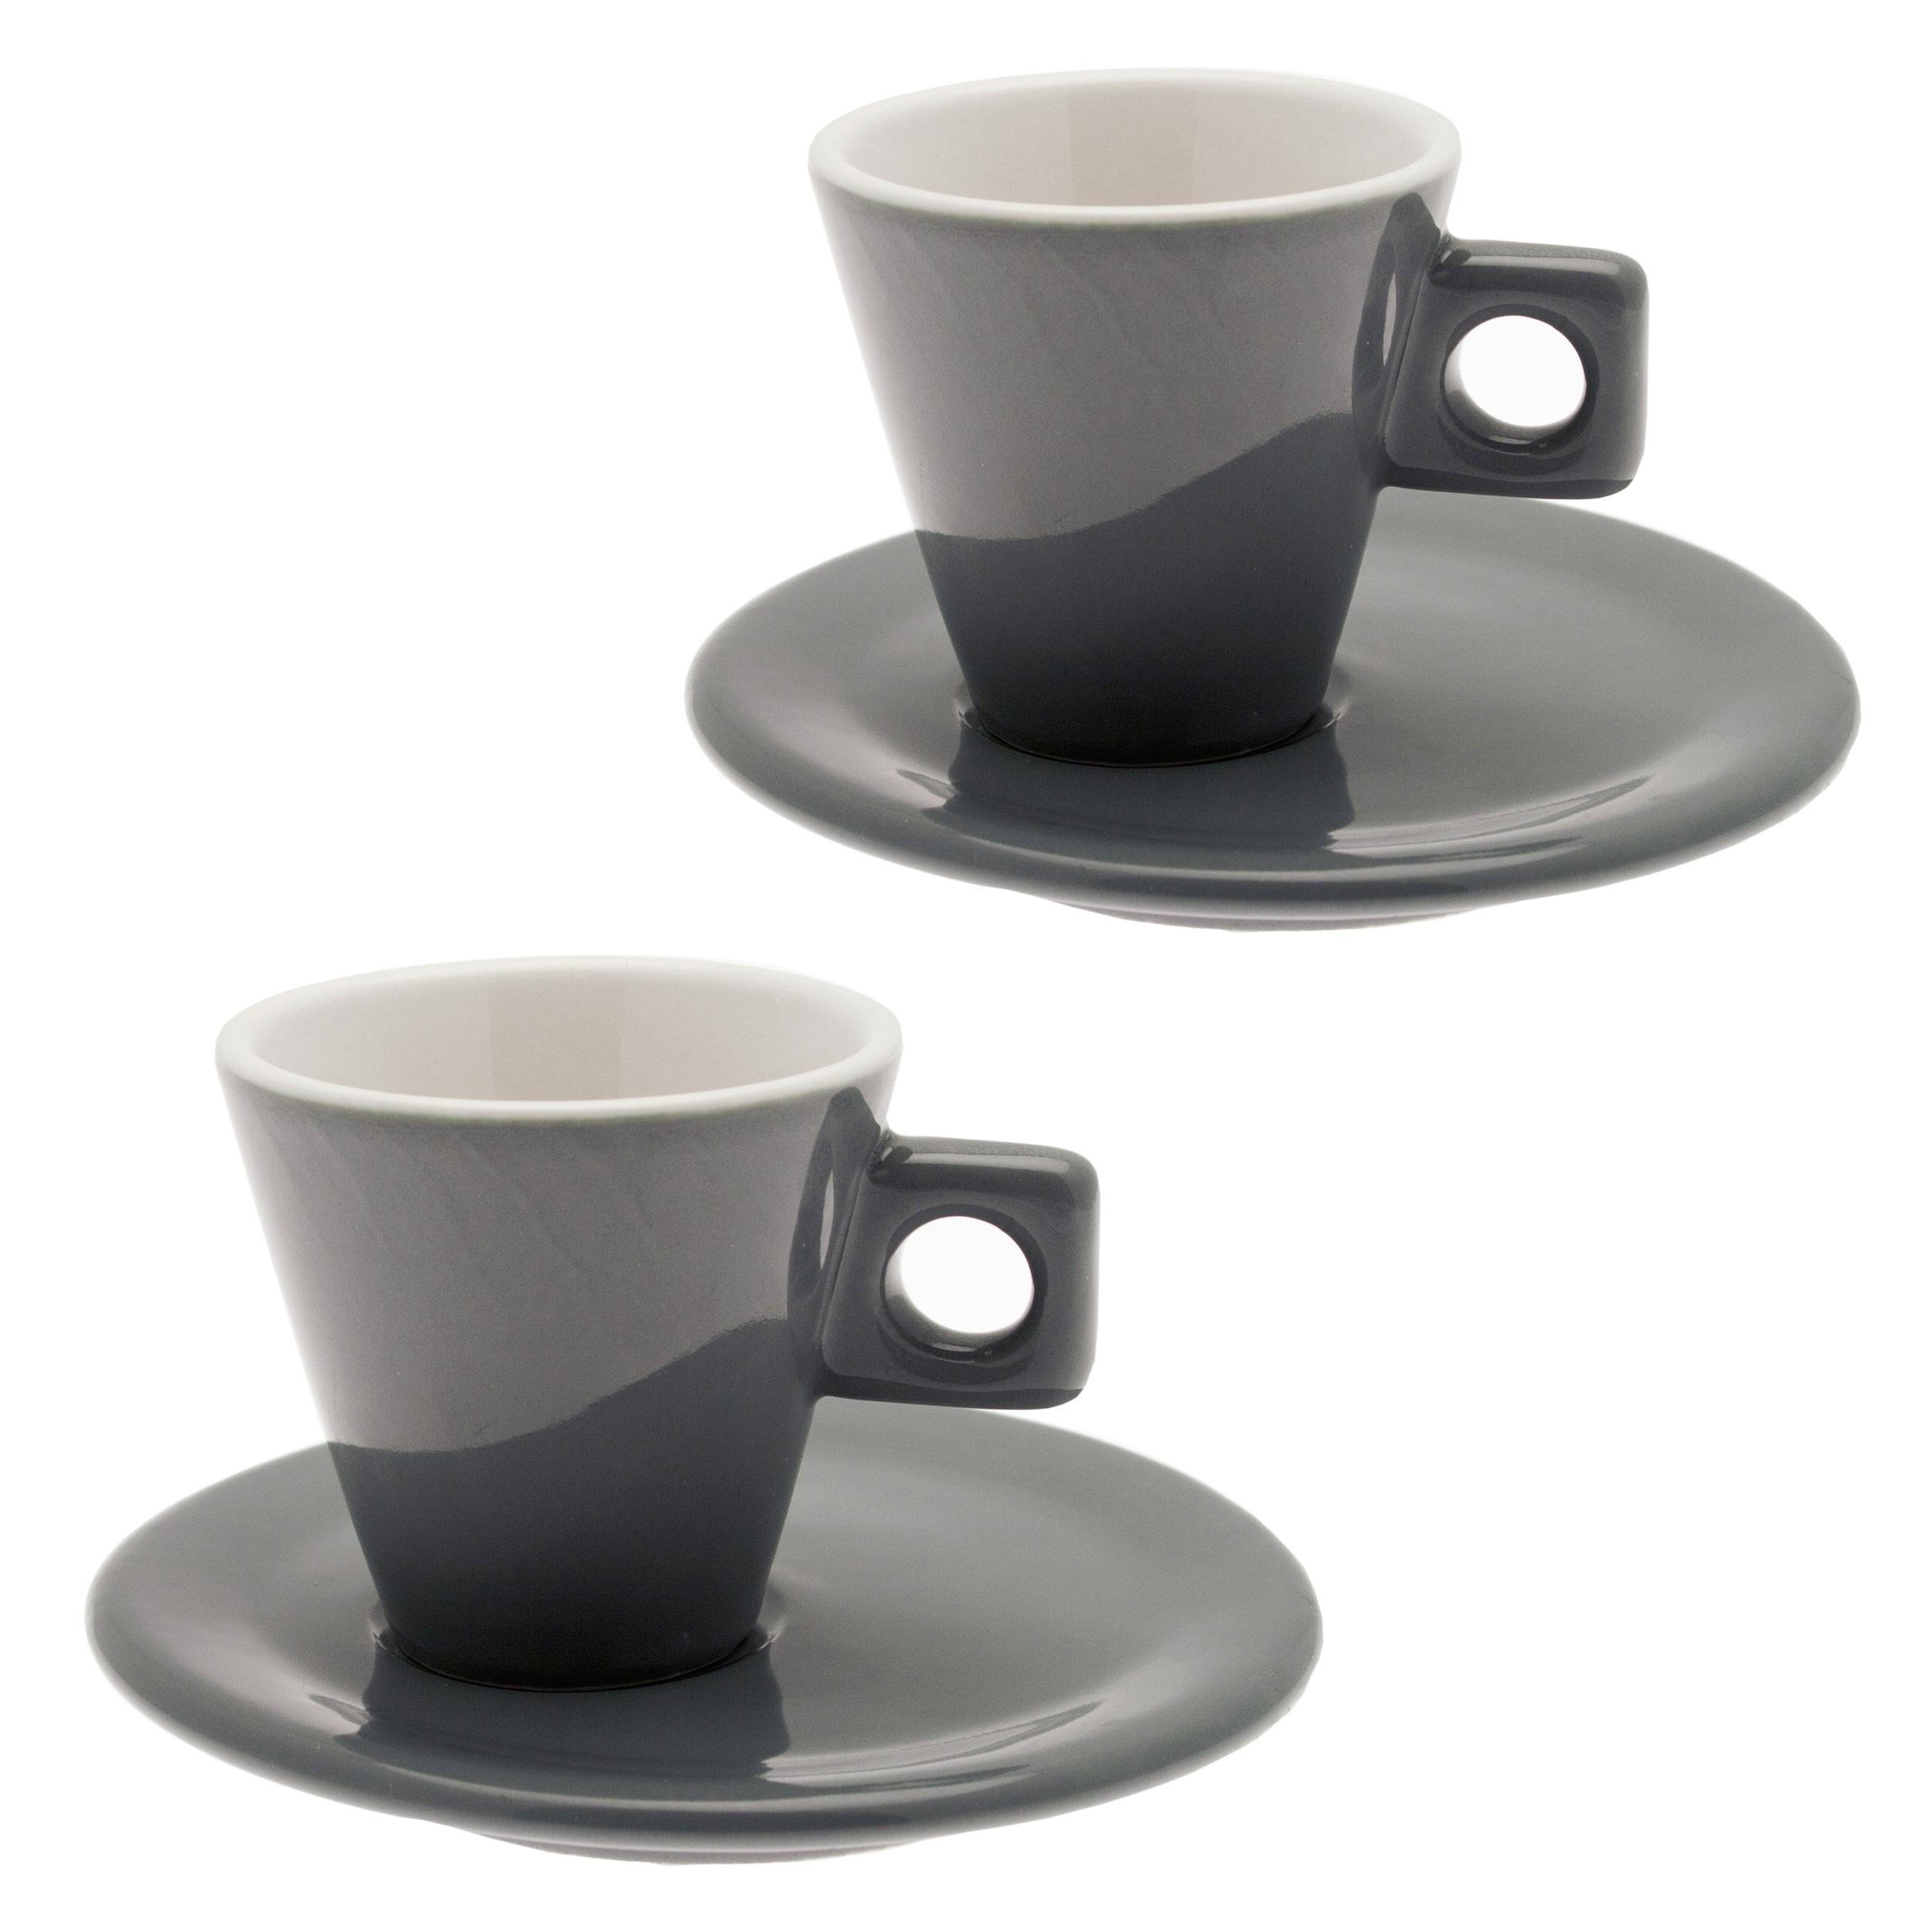 nespresso espresso tassen beautiful with nespresso espresso tassen trendy touch espresso lungo. Black Bedroom Furniture Sets. Home Design Ideas